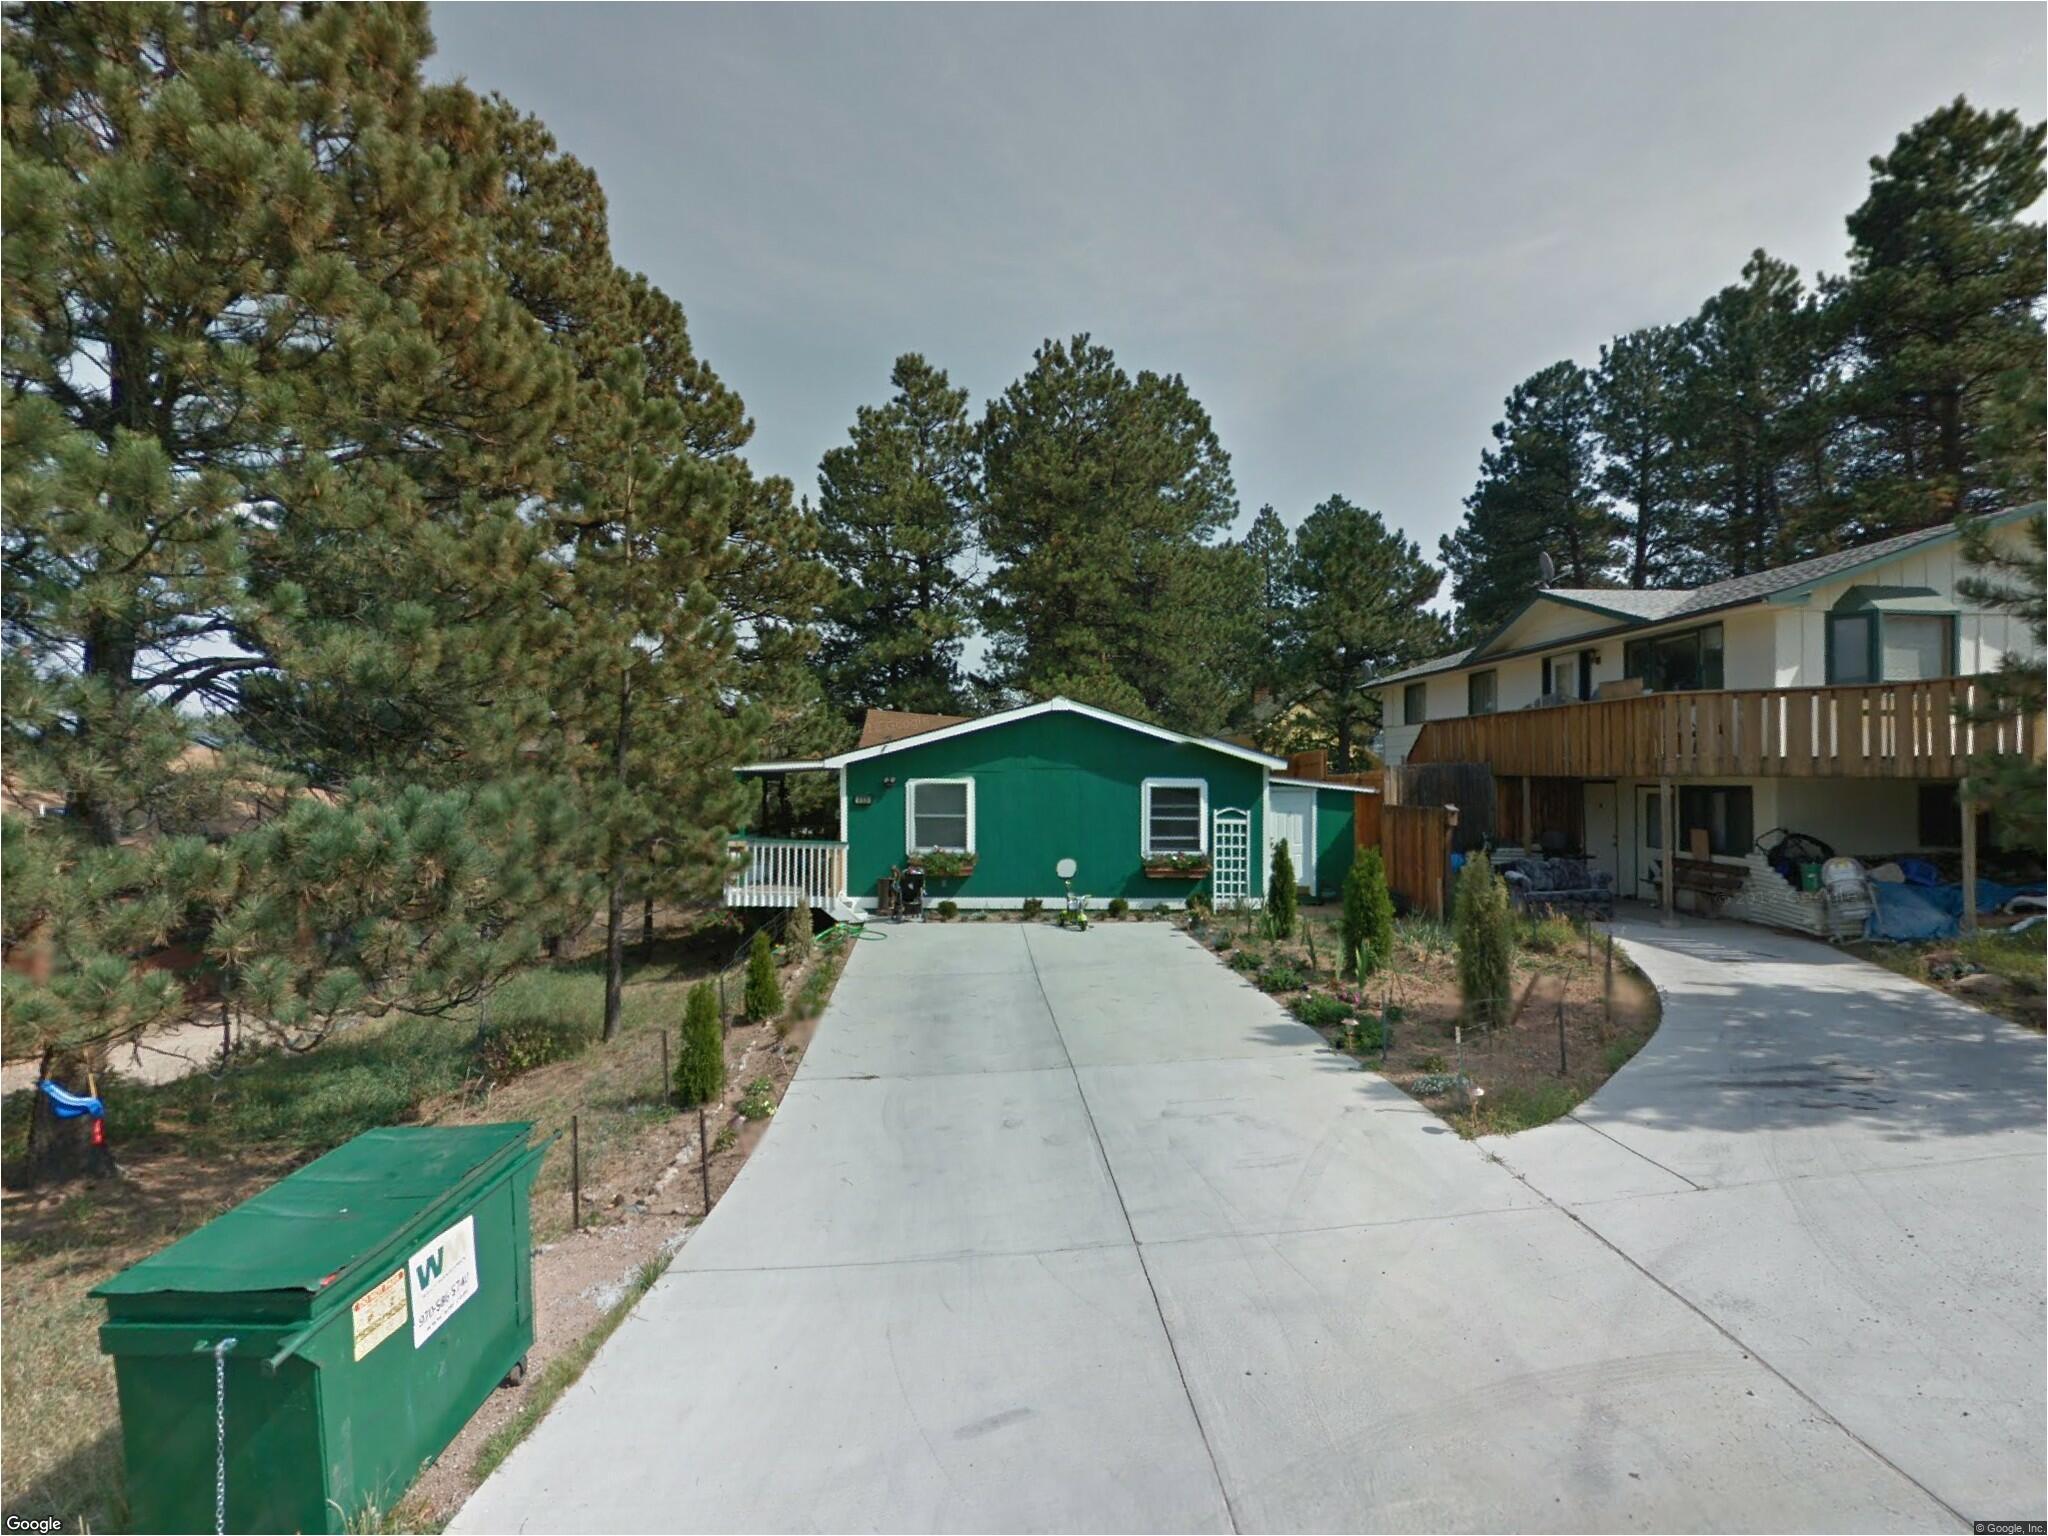 Estes Park Colorado Homes for Sale 460 Driftwood Ave Estes Park Co 80517 Trulia